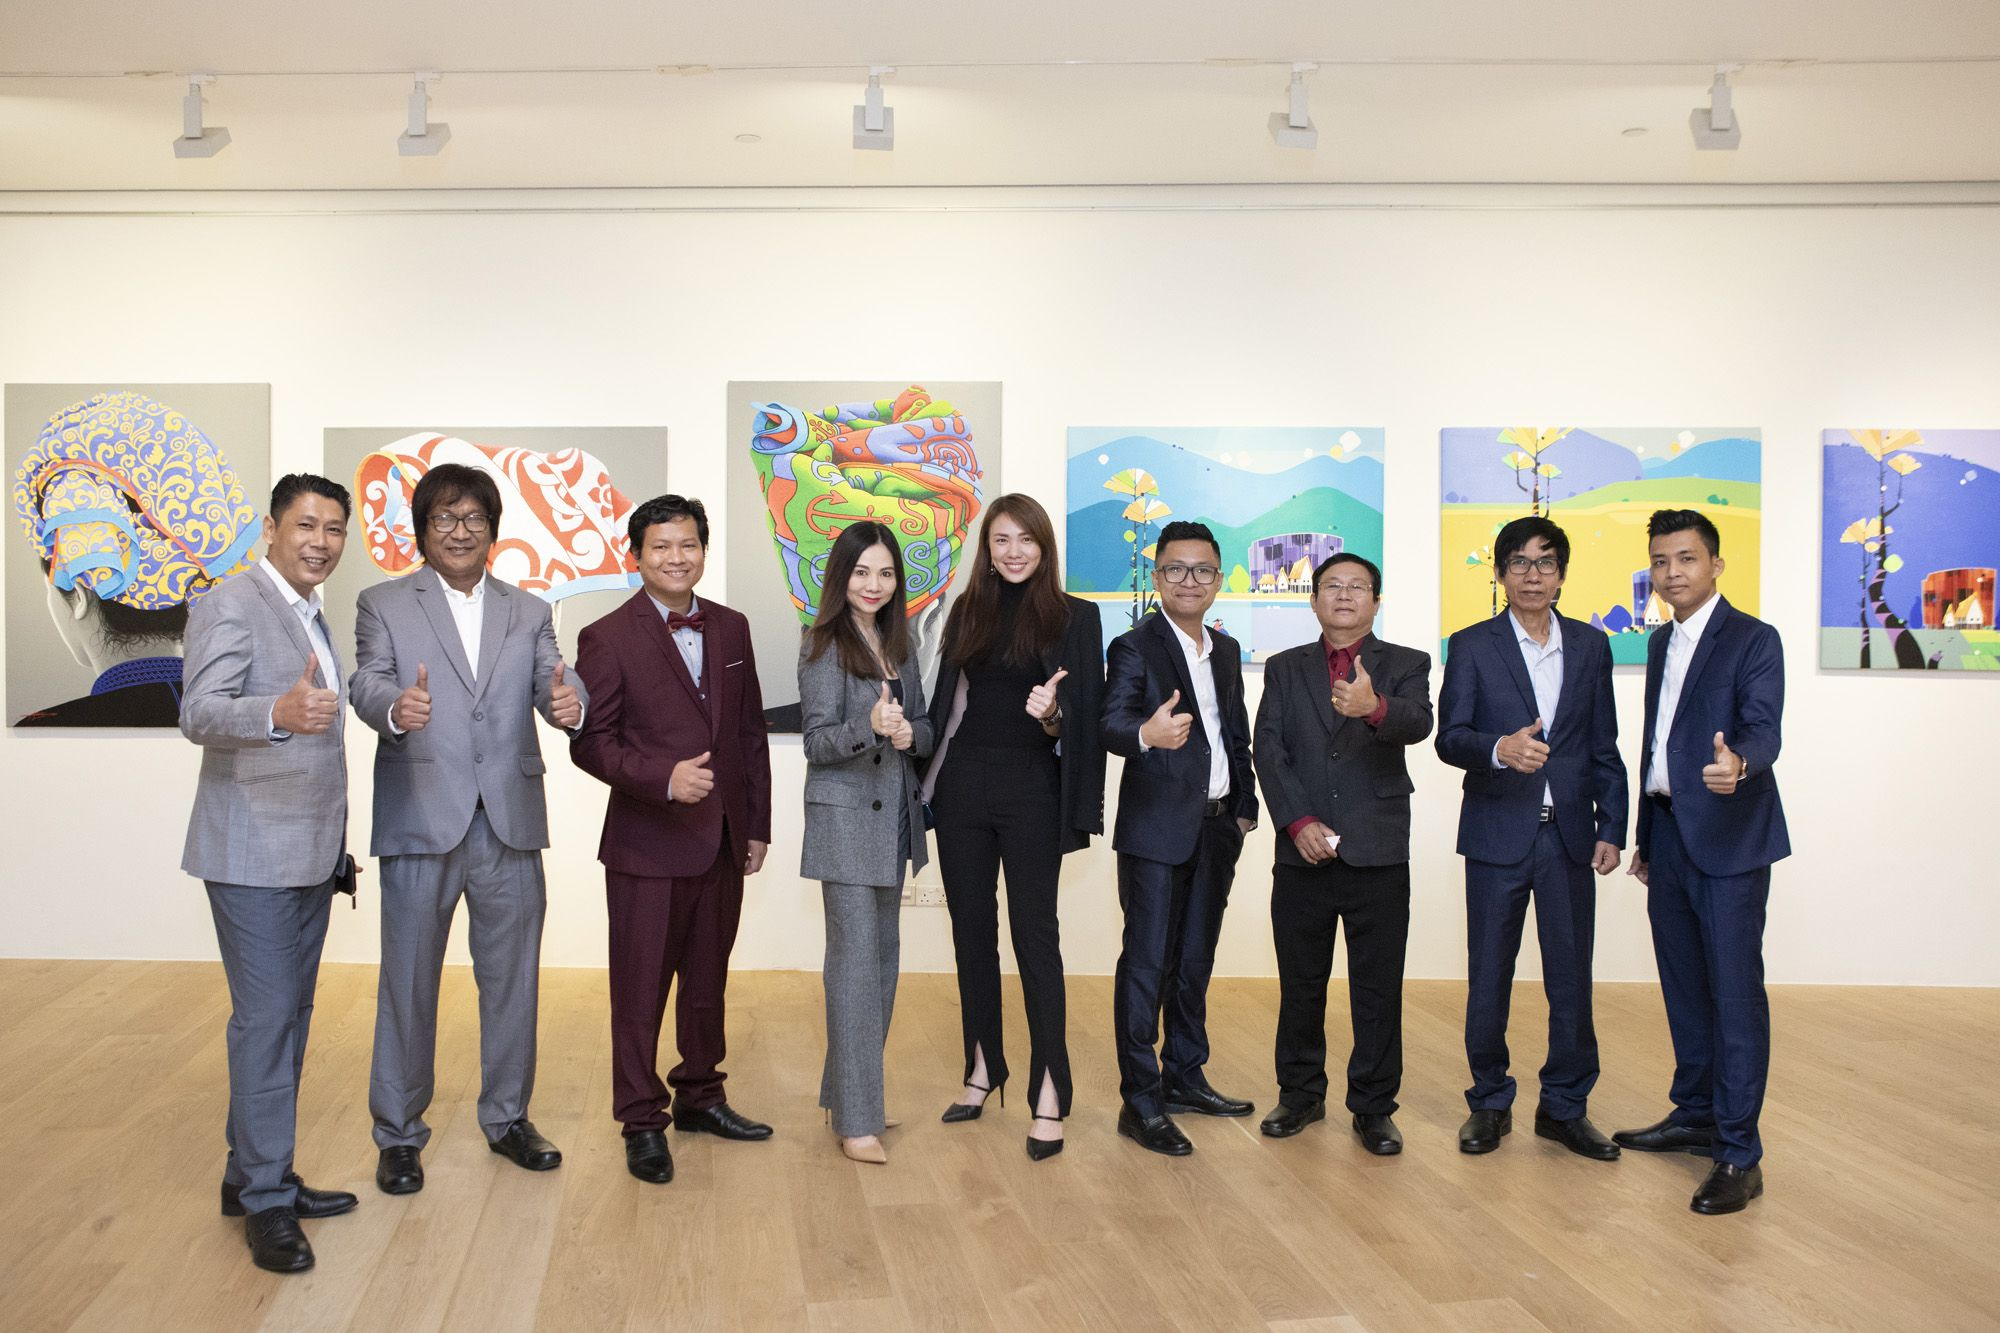 Moe Myint Zaw, CNK, Min Zayar Oo, Jacelyn Lai, Jasmine Foo, Ngwe Phyoe, Ngwe Aung, Kyi Hlaing Aung, Lapyae, Zat